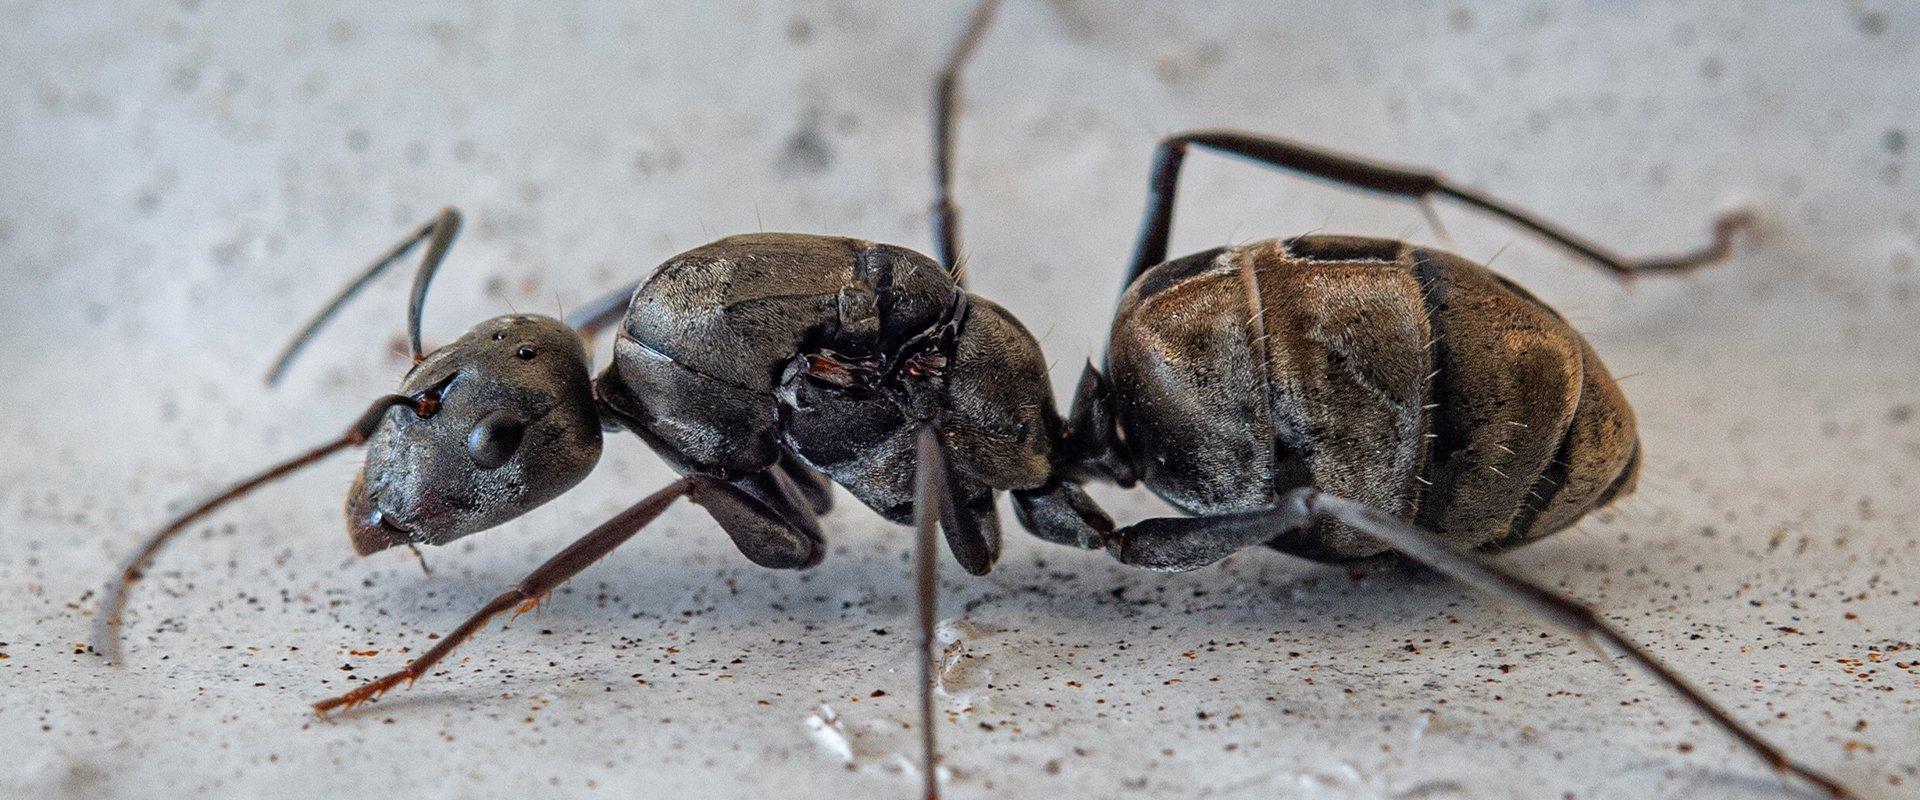 carpenter ant on ground